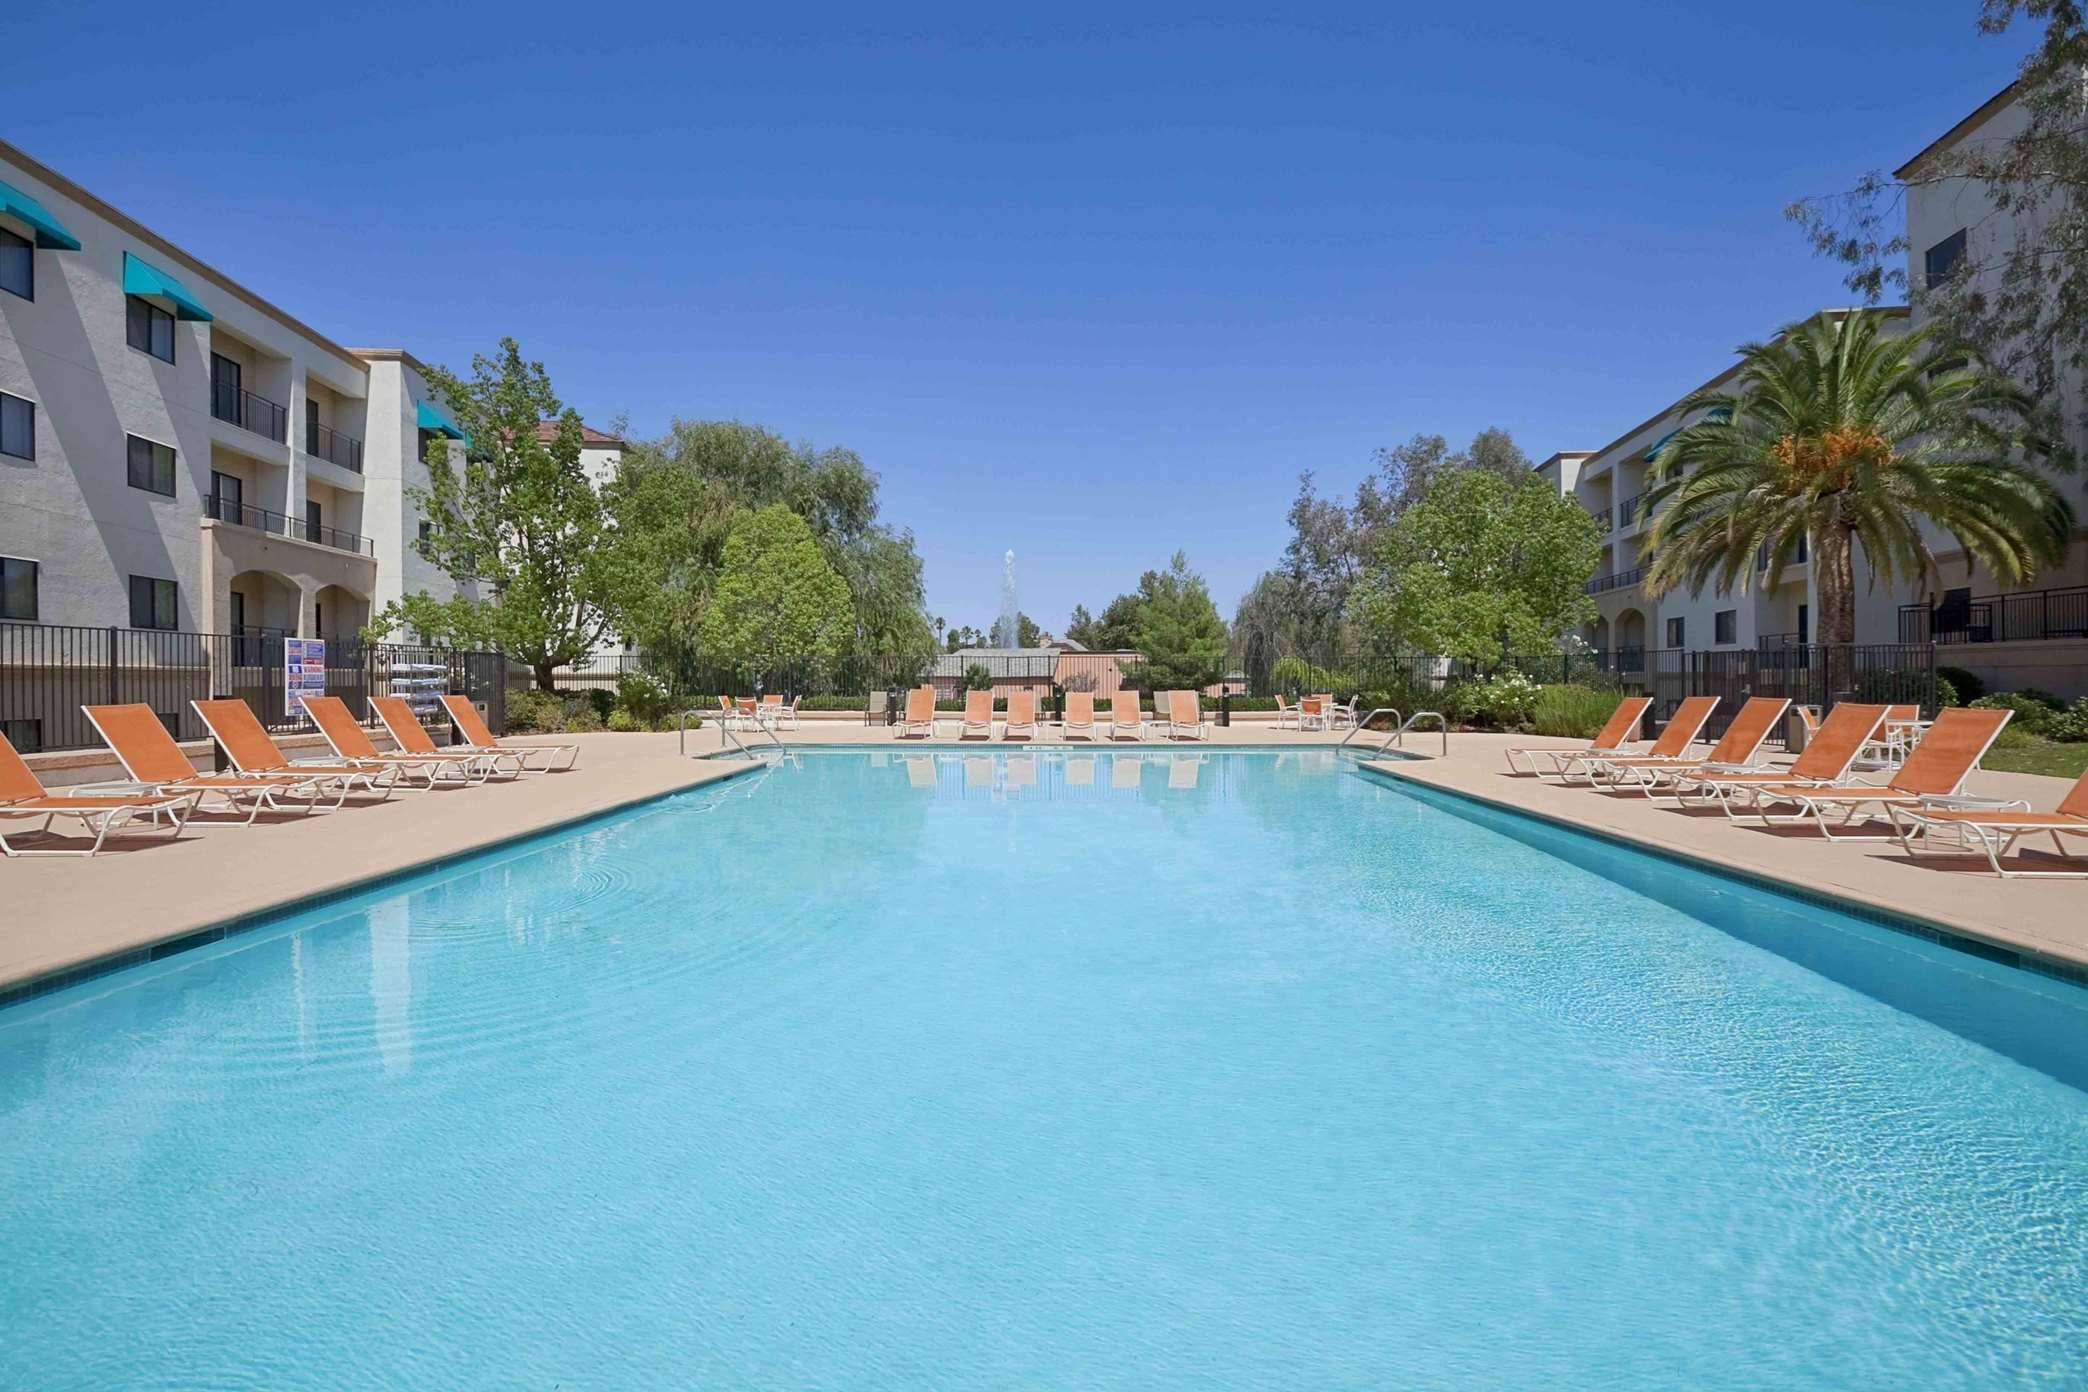 Temecula Hilton Hotels